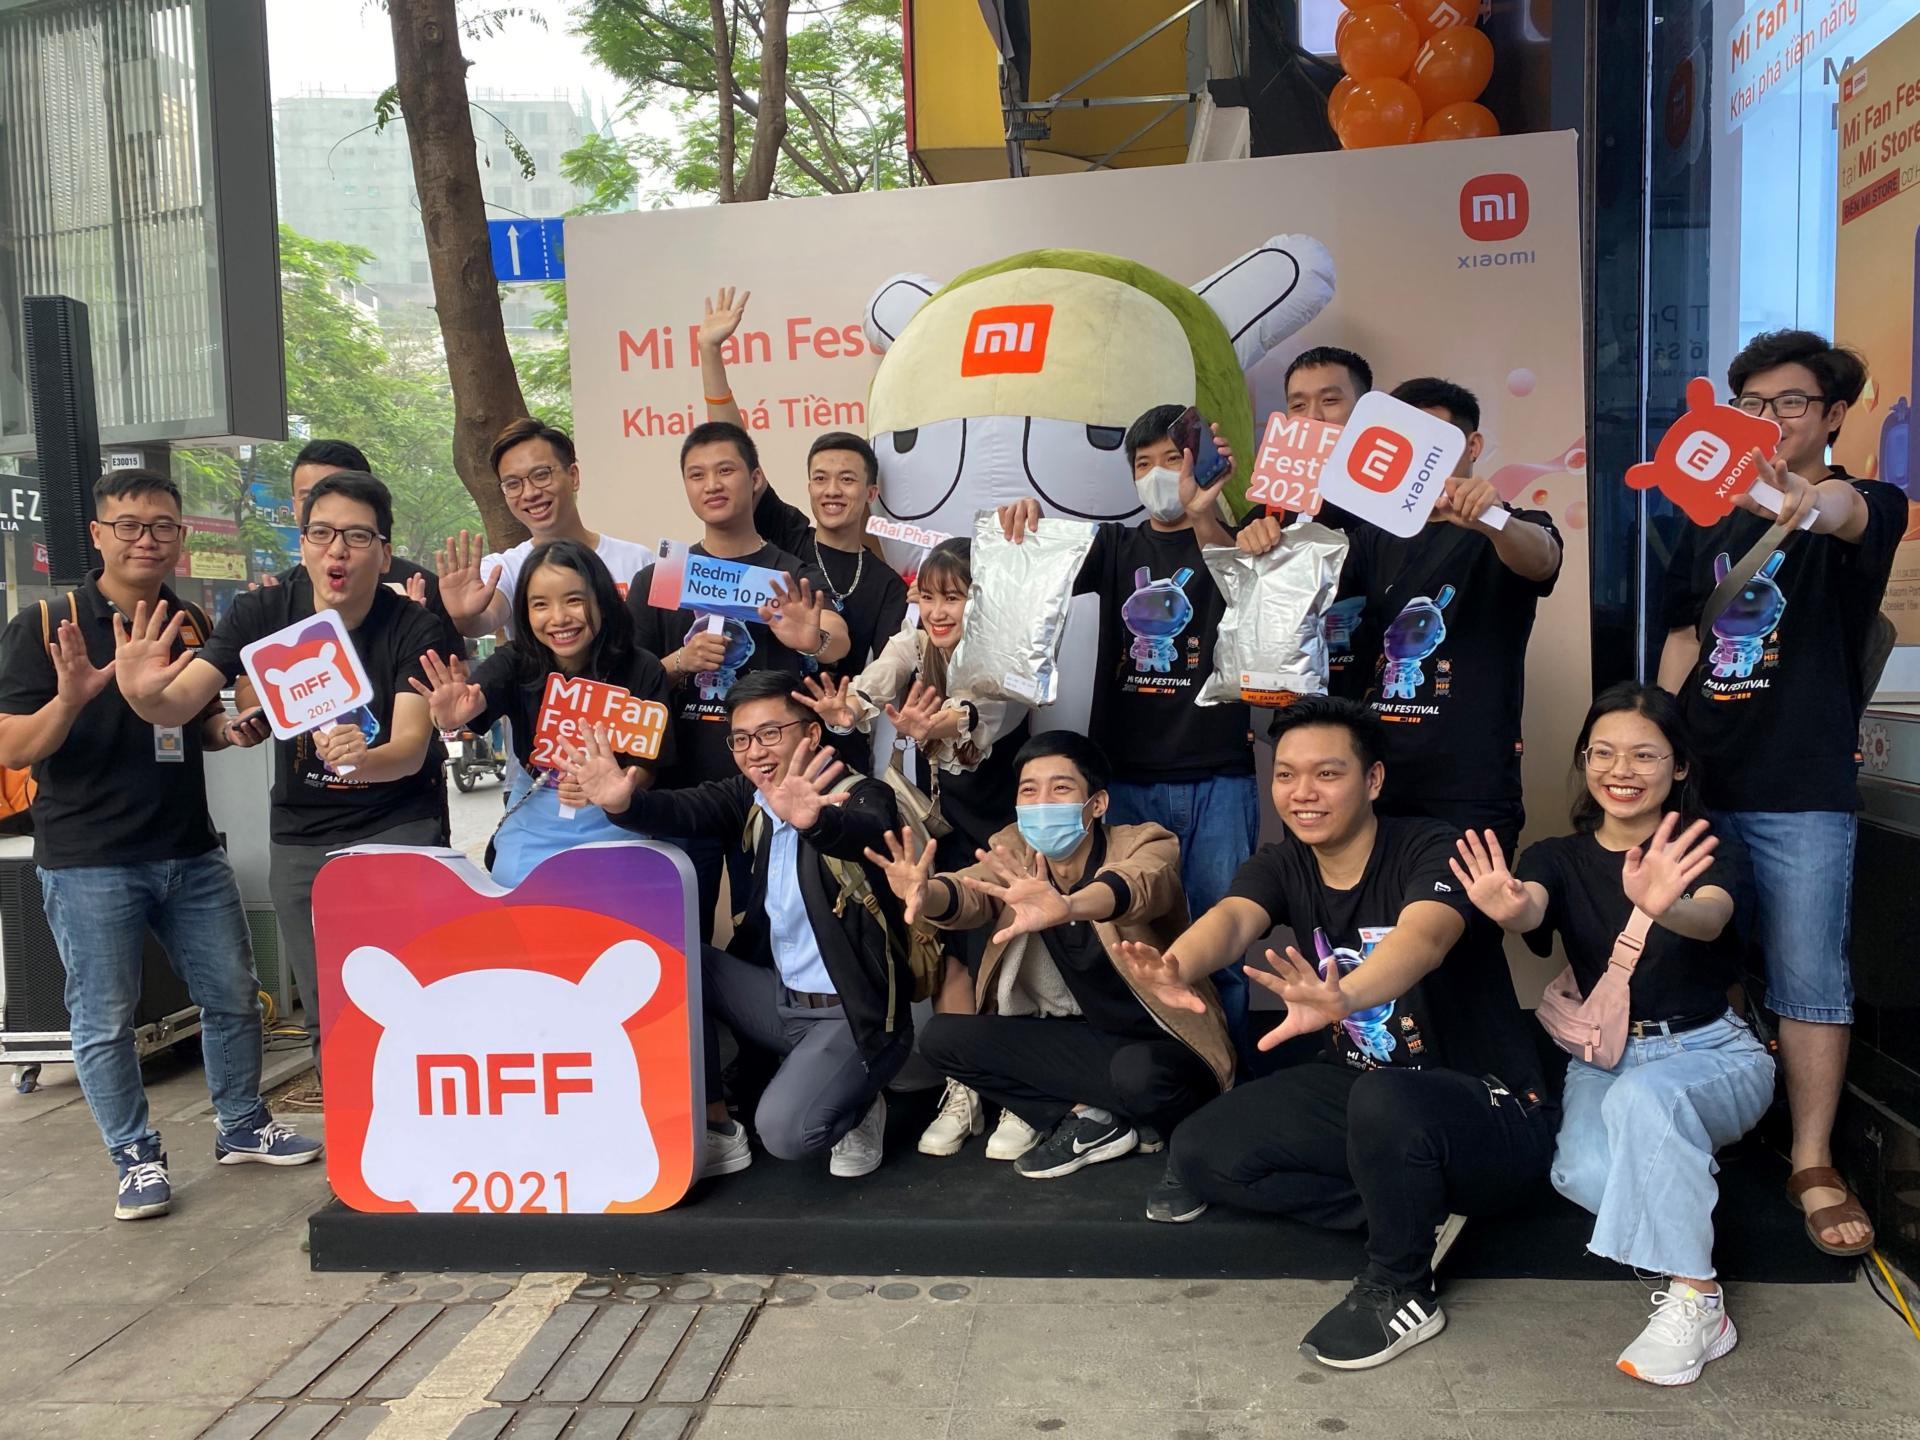 Mi Fan Festival 2021 ghi nhận những dấu ấn từ Xiaomi